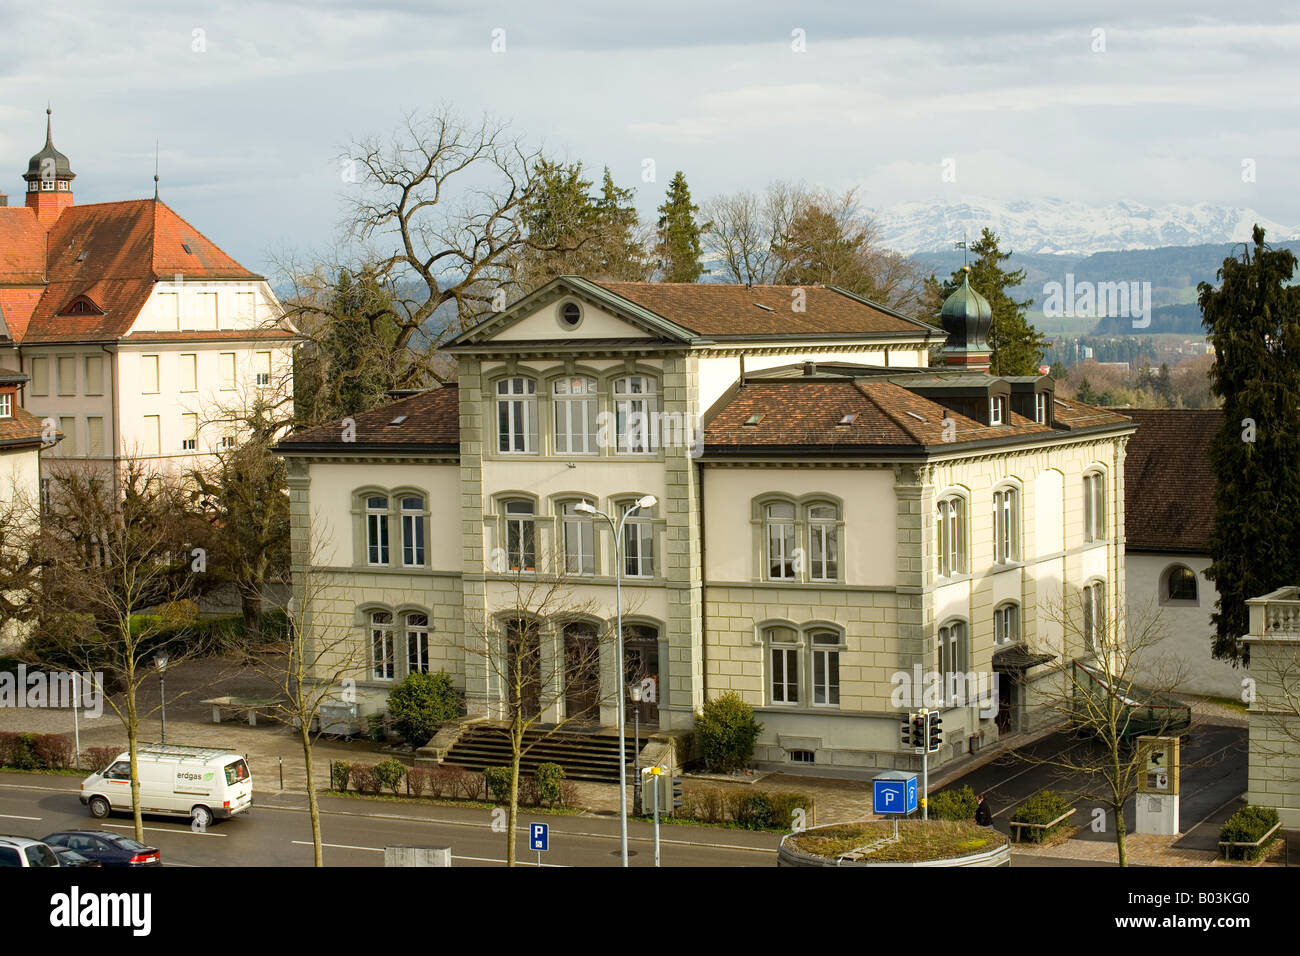 Building in Wil, Switzerland - Stock Image